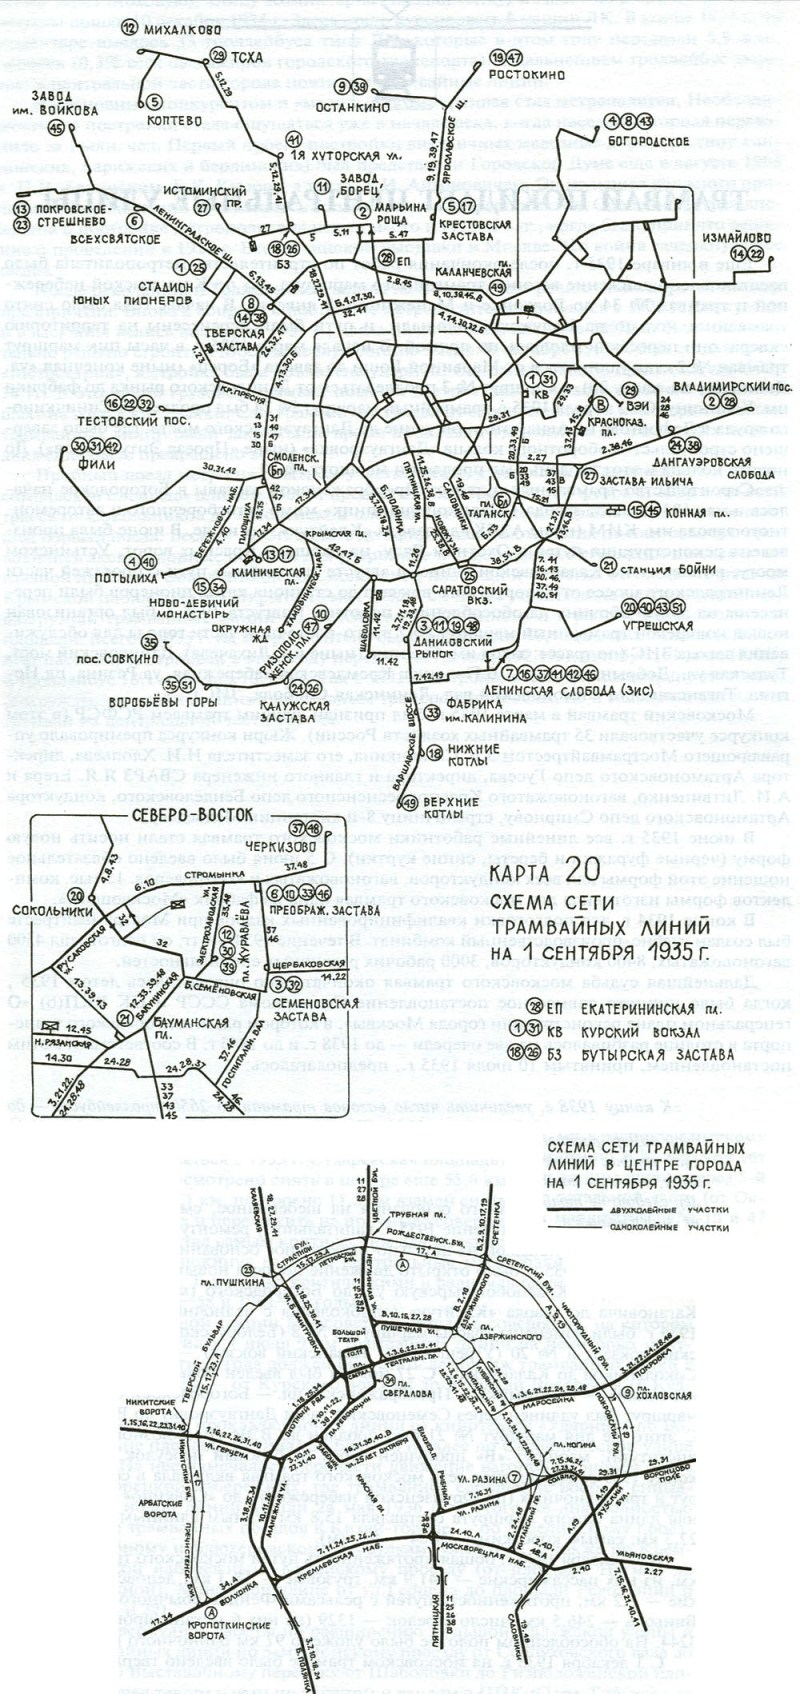 RUSSIA | Urban Transport Compilation - Página 173